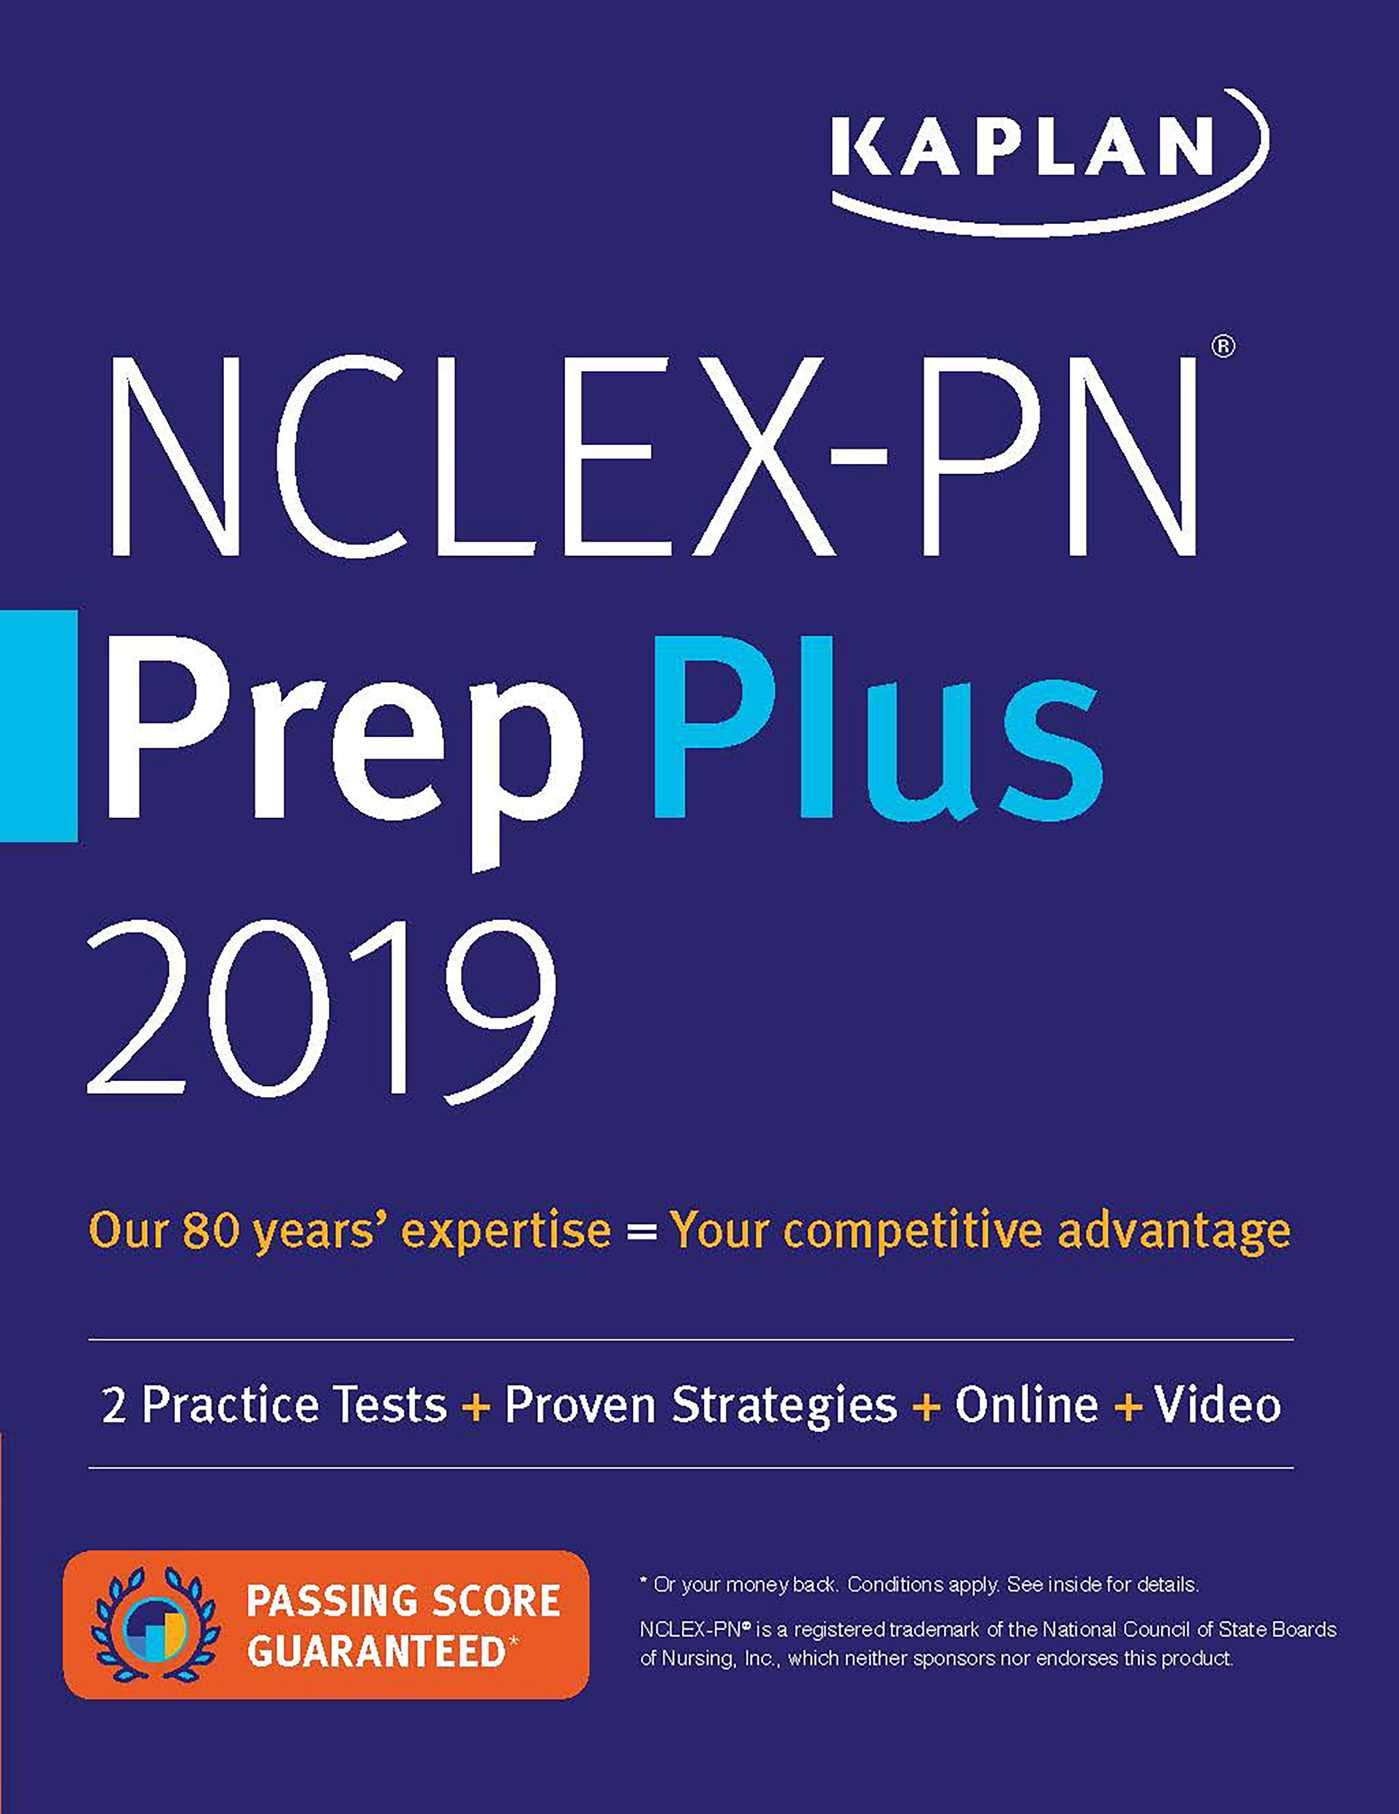 NCLEX-PN Prep Plus 2019: 2 Practice Tests